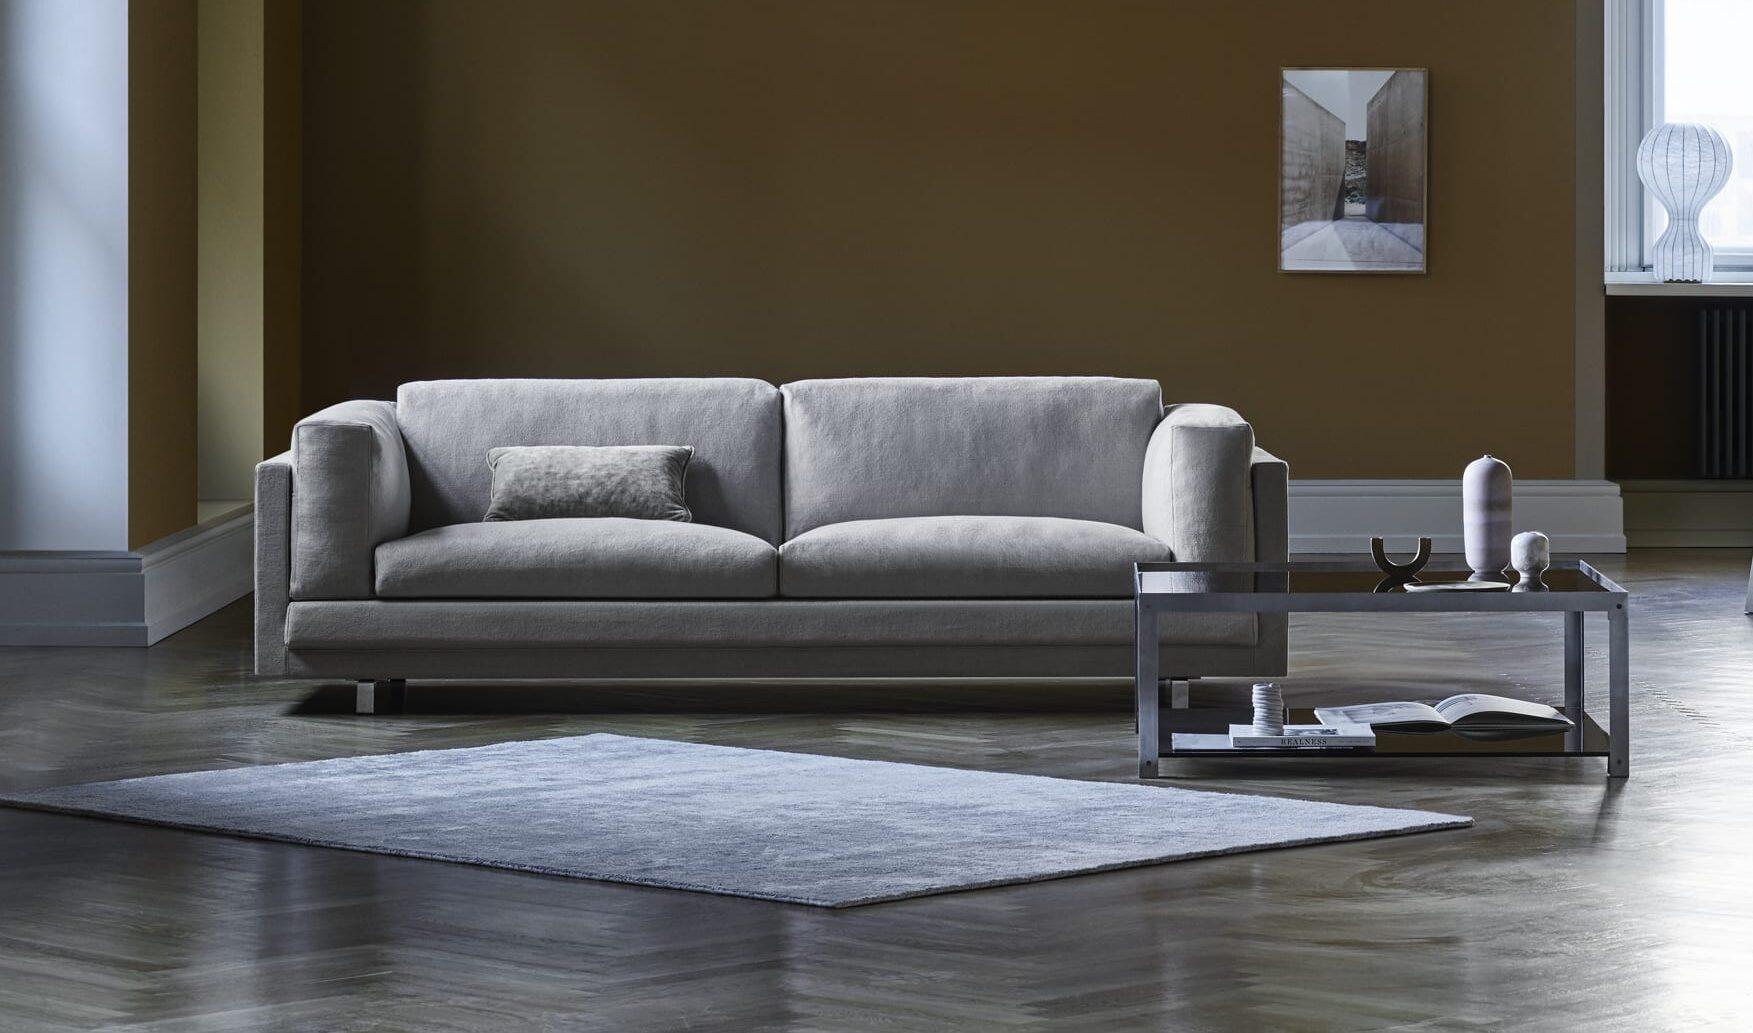 Tub sofa model Eilersen